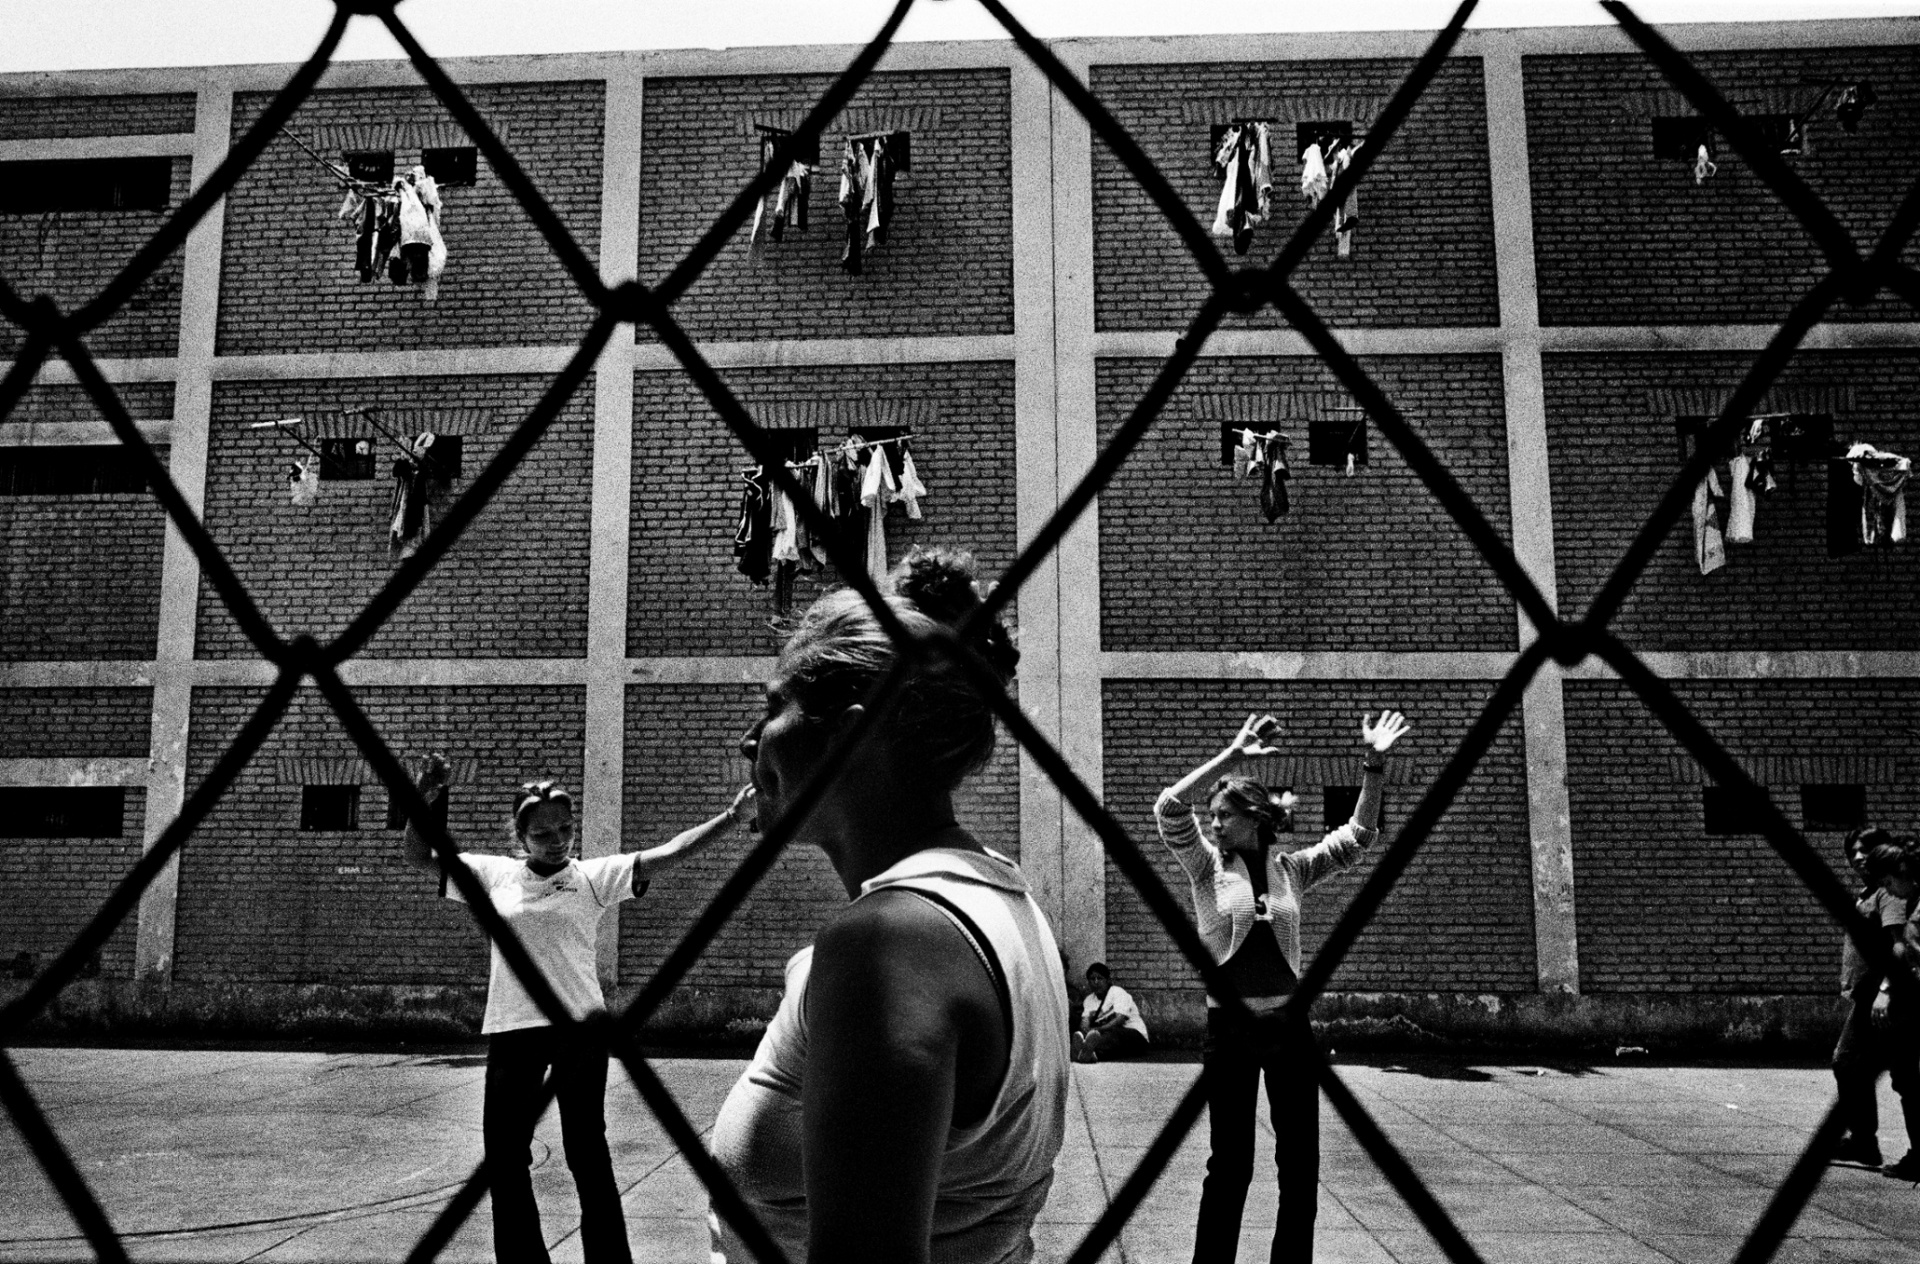 fotograf Valerio Bispuri 5